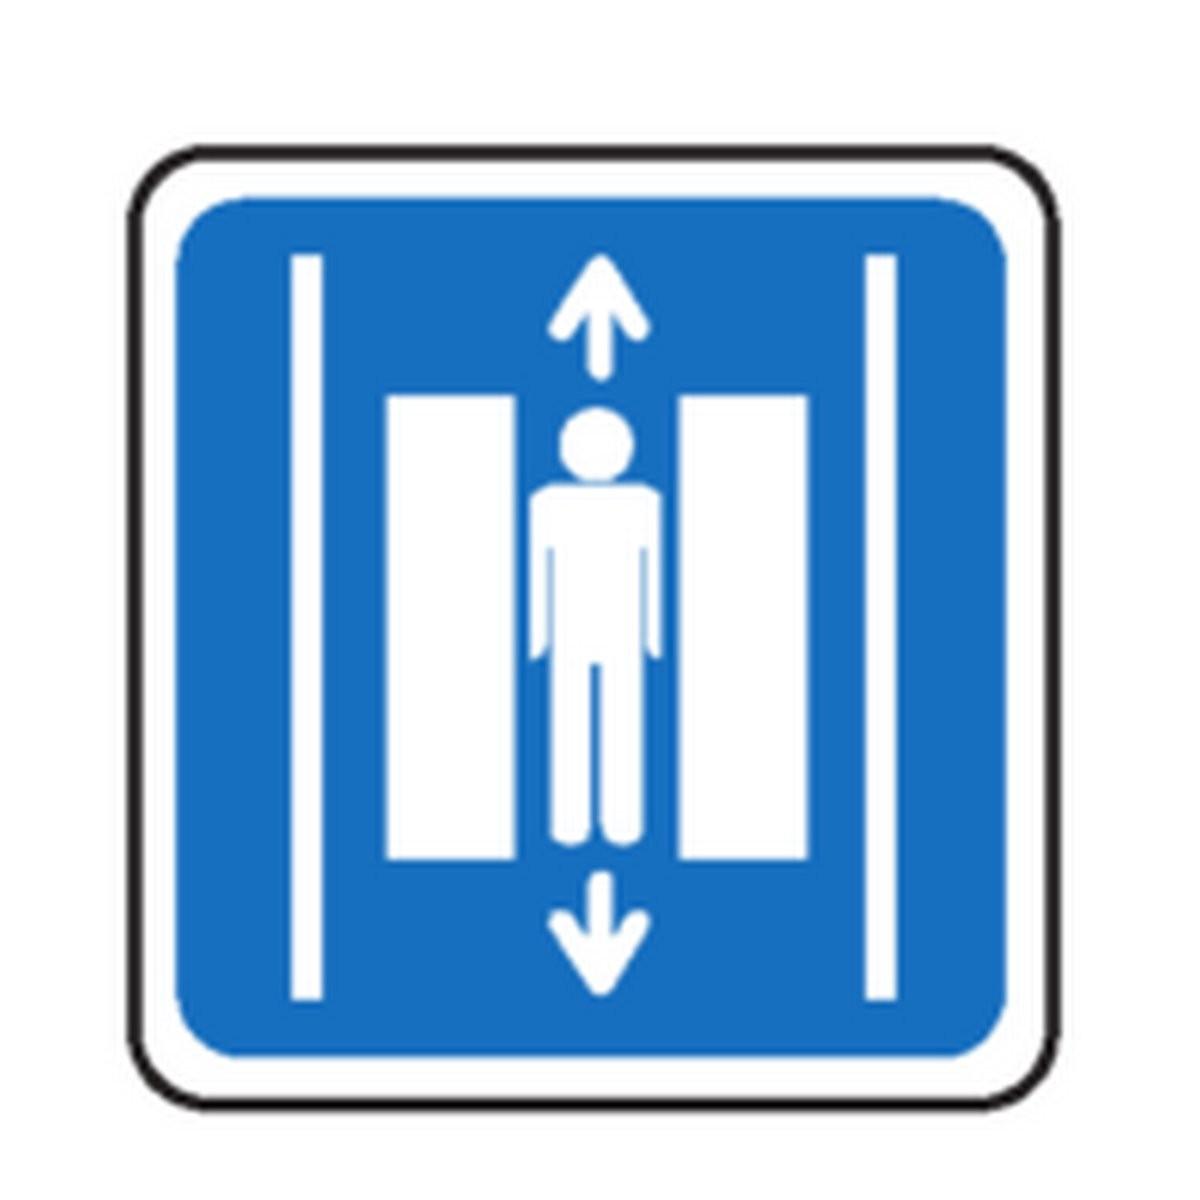 Ascenseur Picto